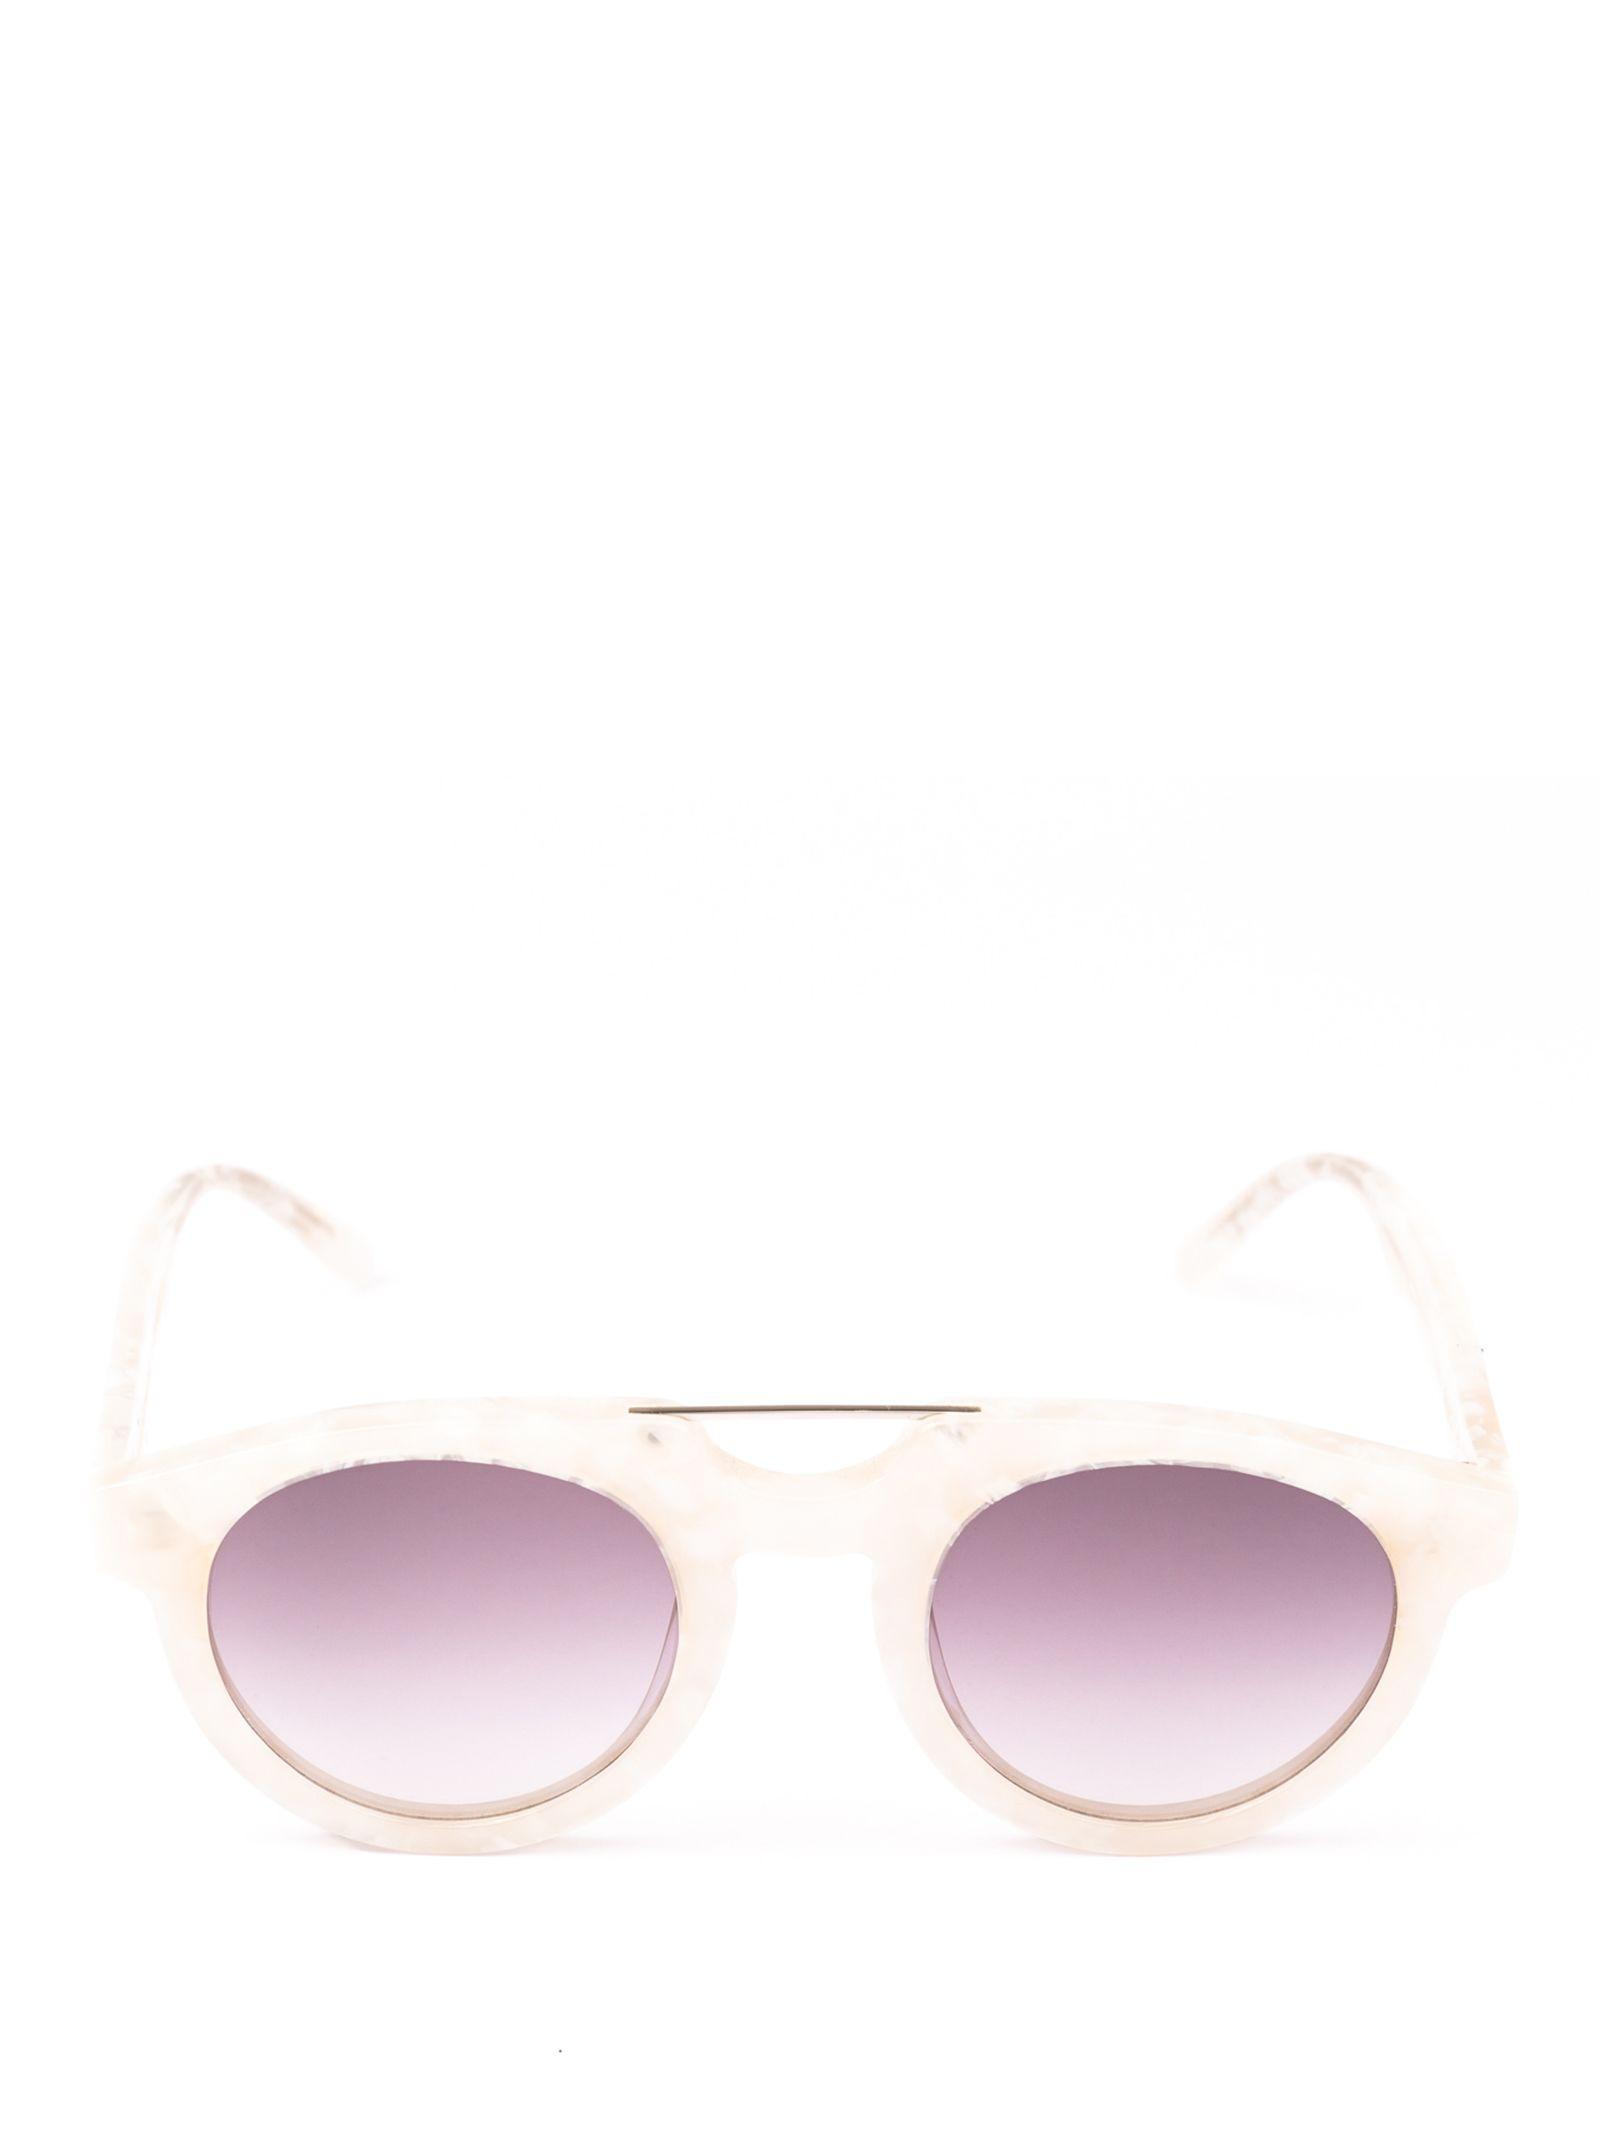 SPEKTRE Sunglasses in M.Perla